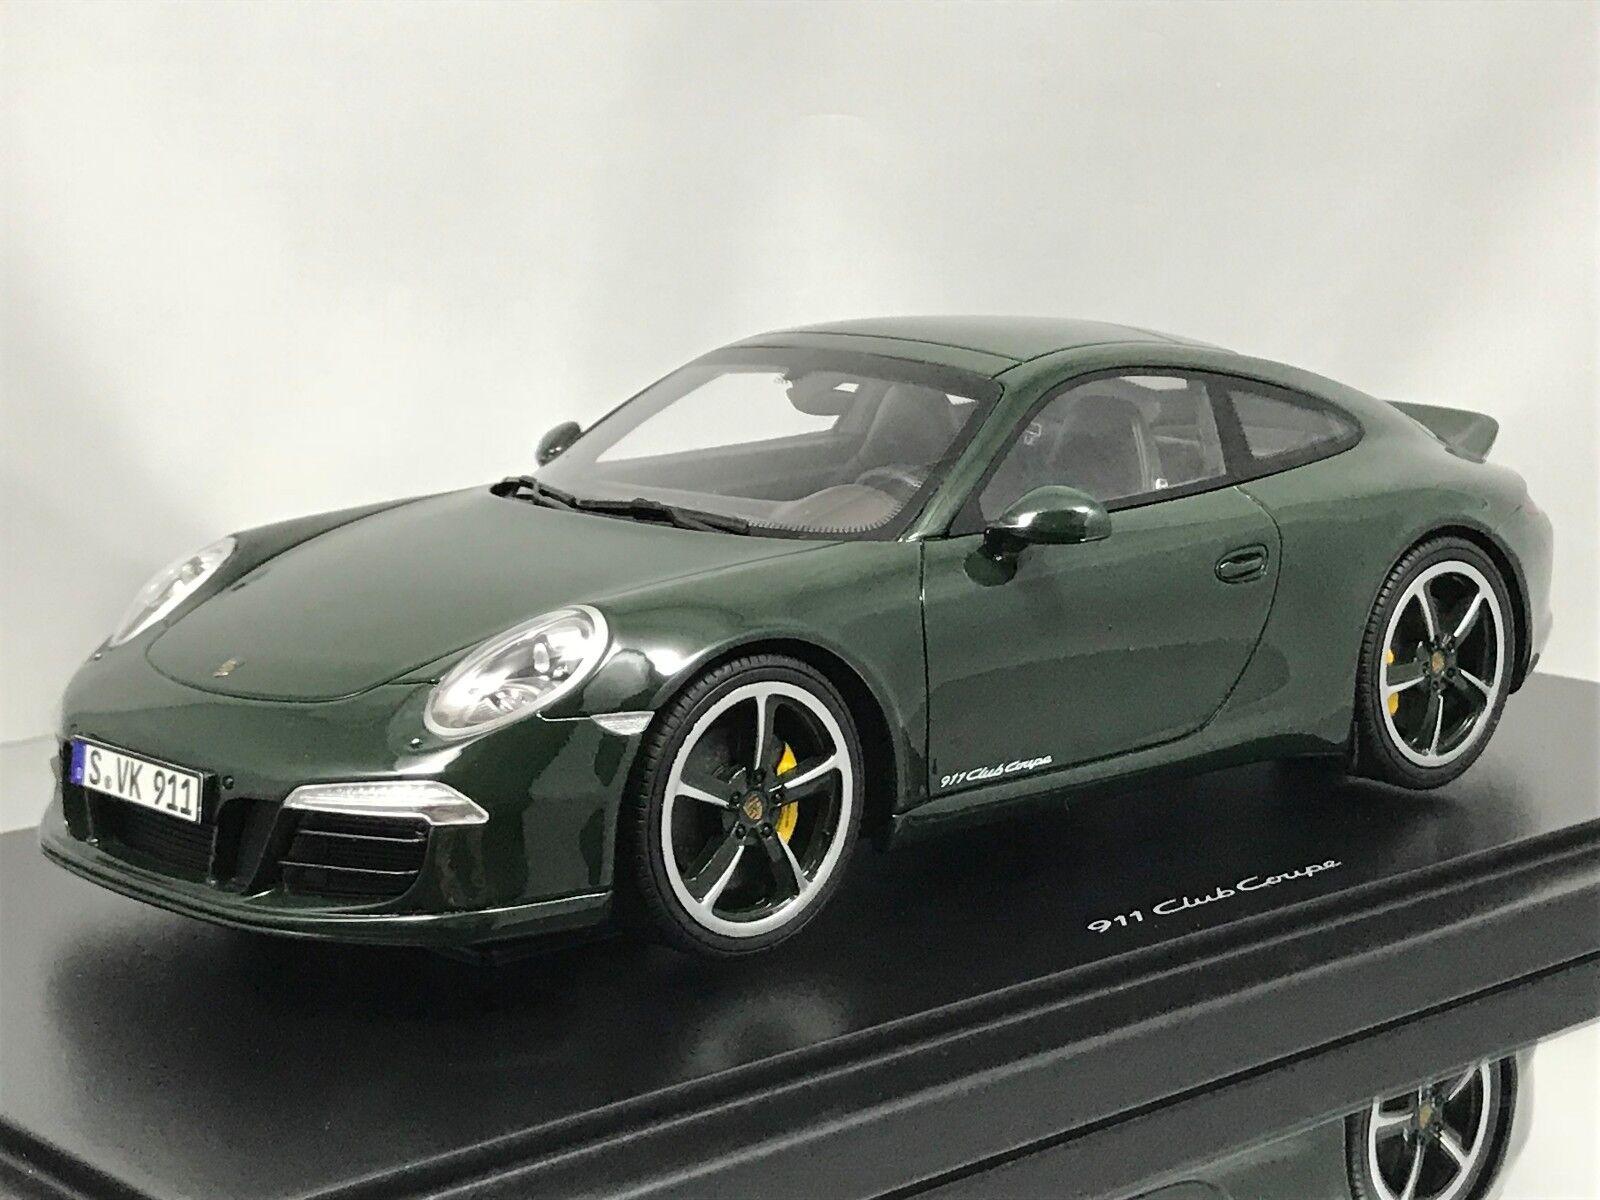 GT Spirit Porsche 911 (991) Carrera S Club Coupe 2014 Green with Showcase 1 18